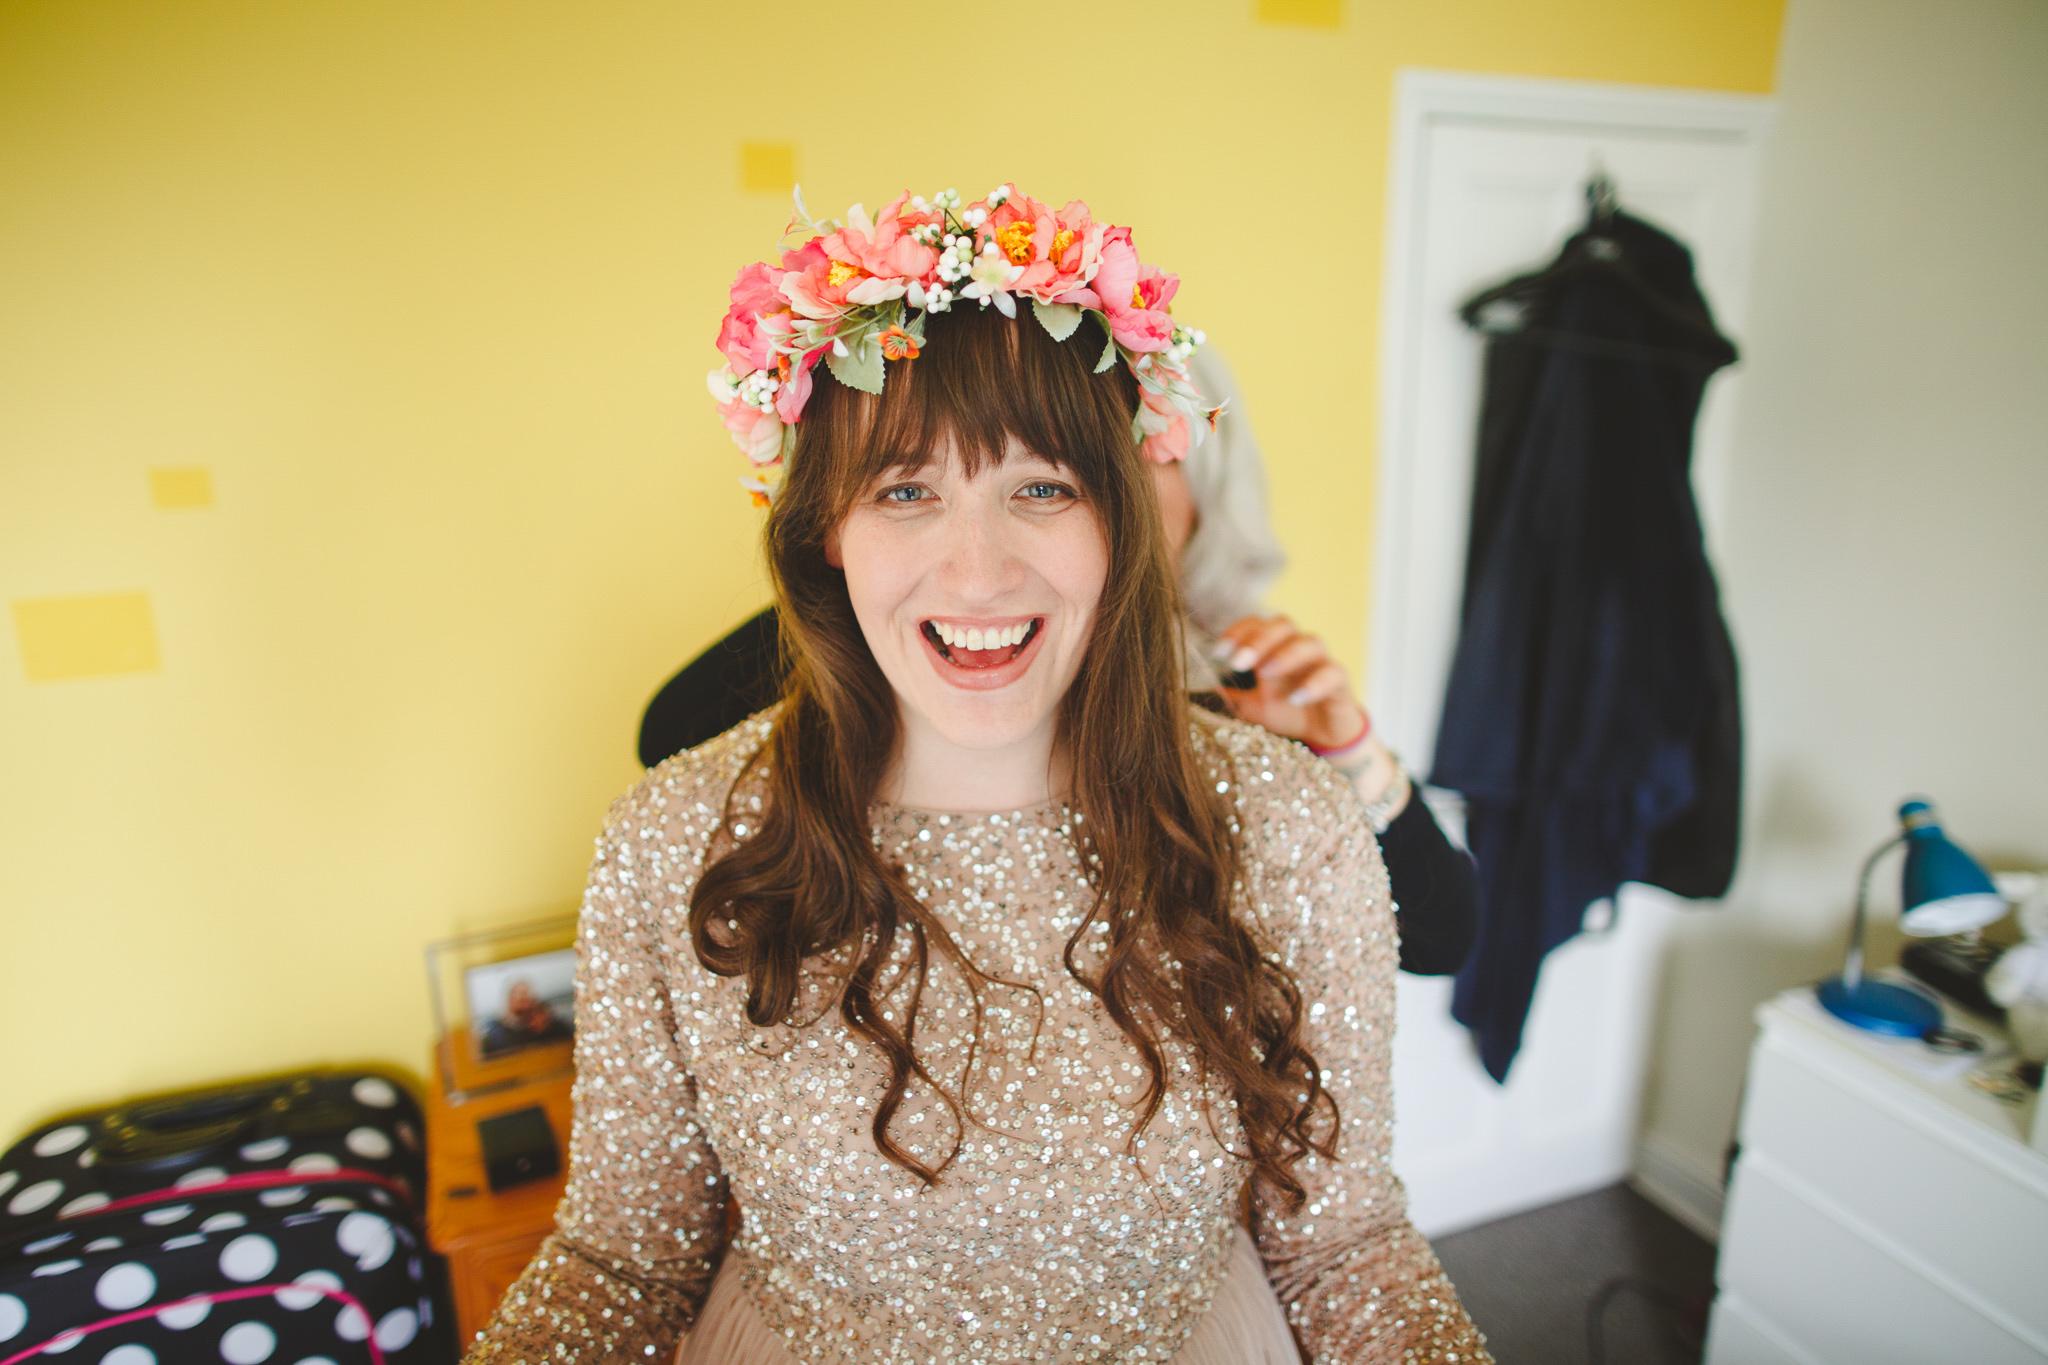 sheffield-wedding-photographer-roxysamblog-6.jpg